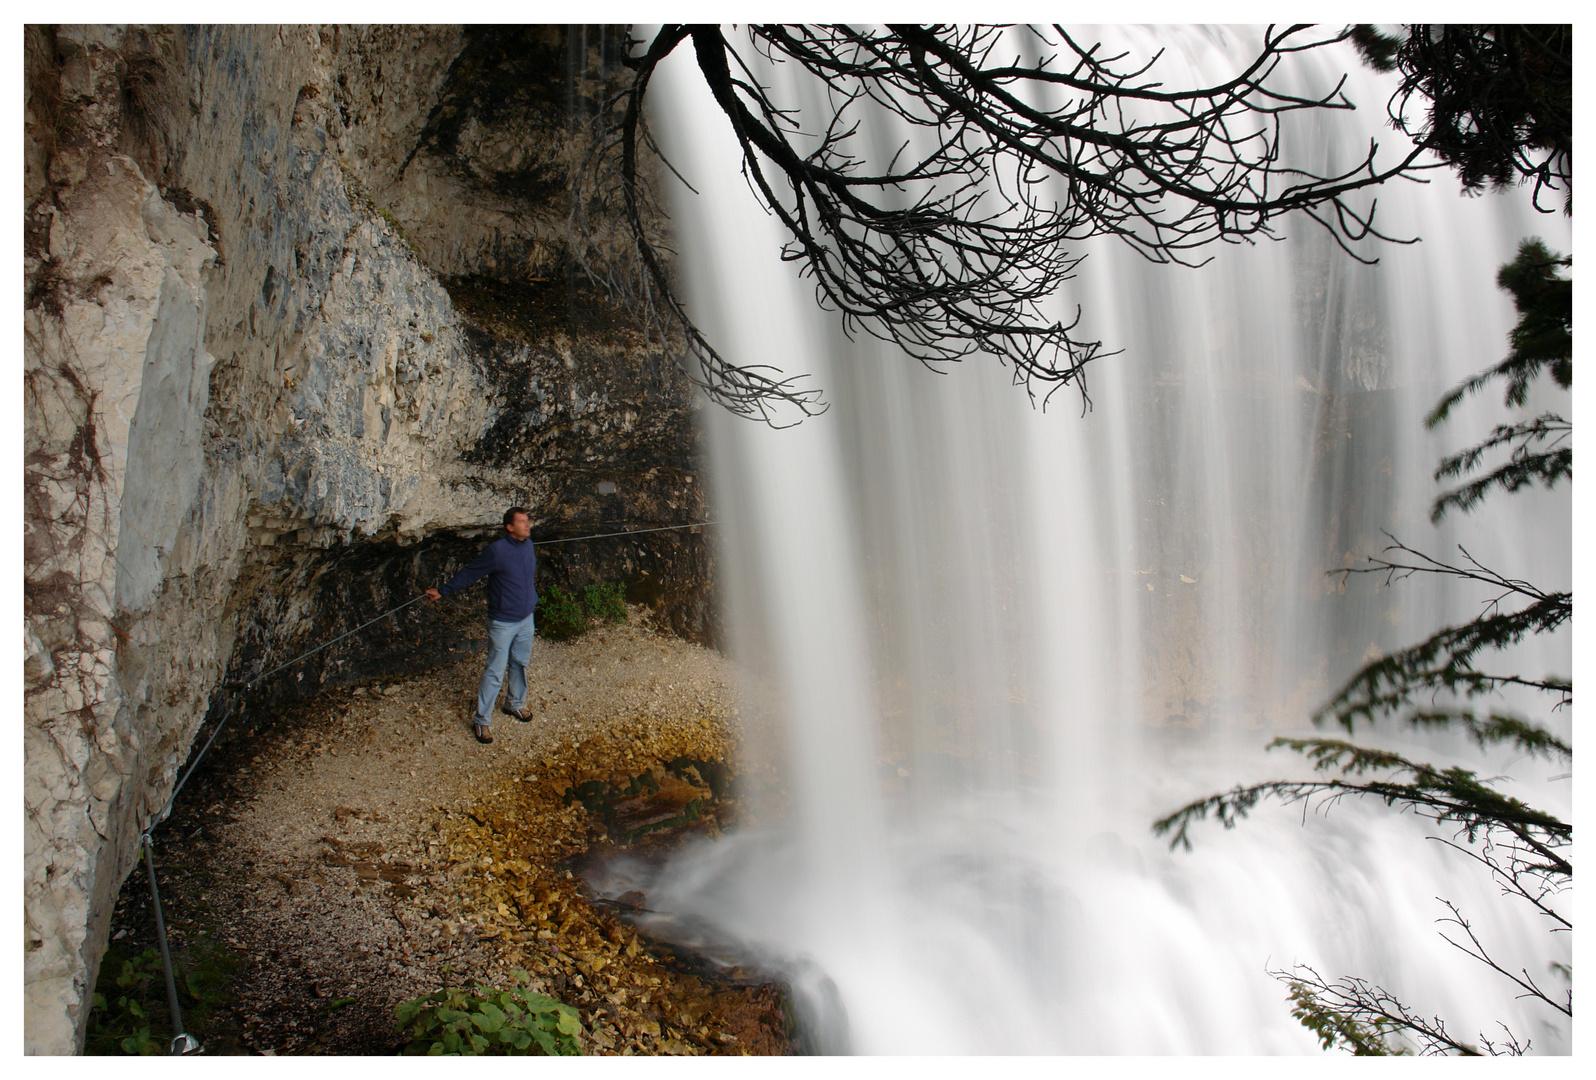 Erlebnis Faneswasserfall 2